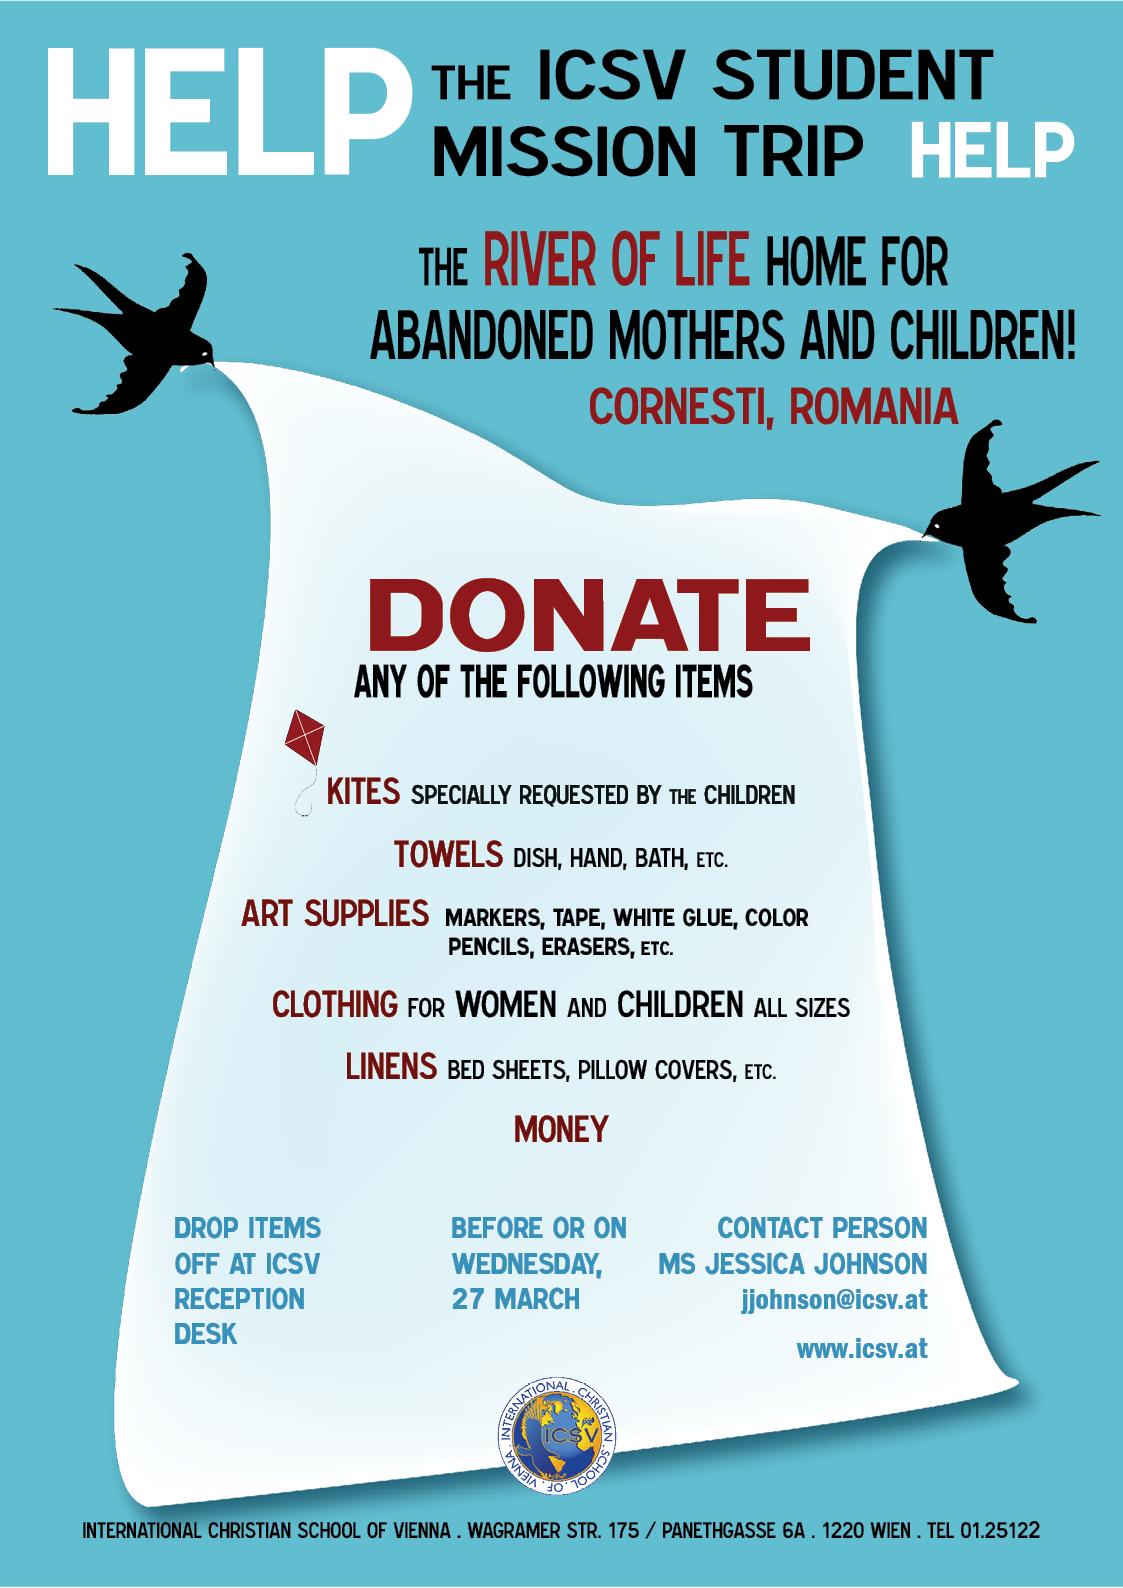 Icsv Romanian Mission Trip Donation Poster 2013 Dax